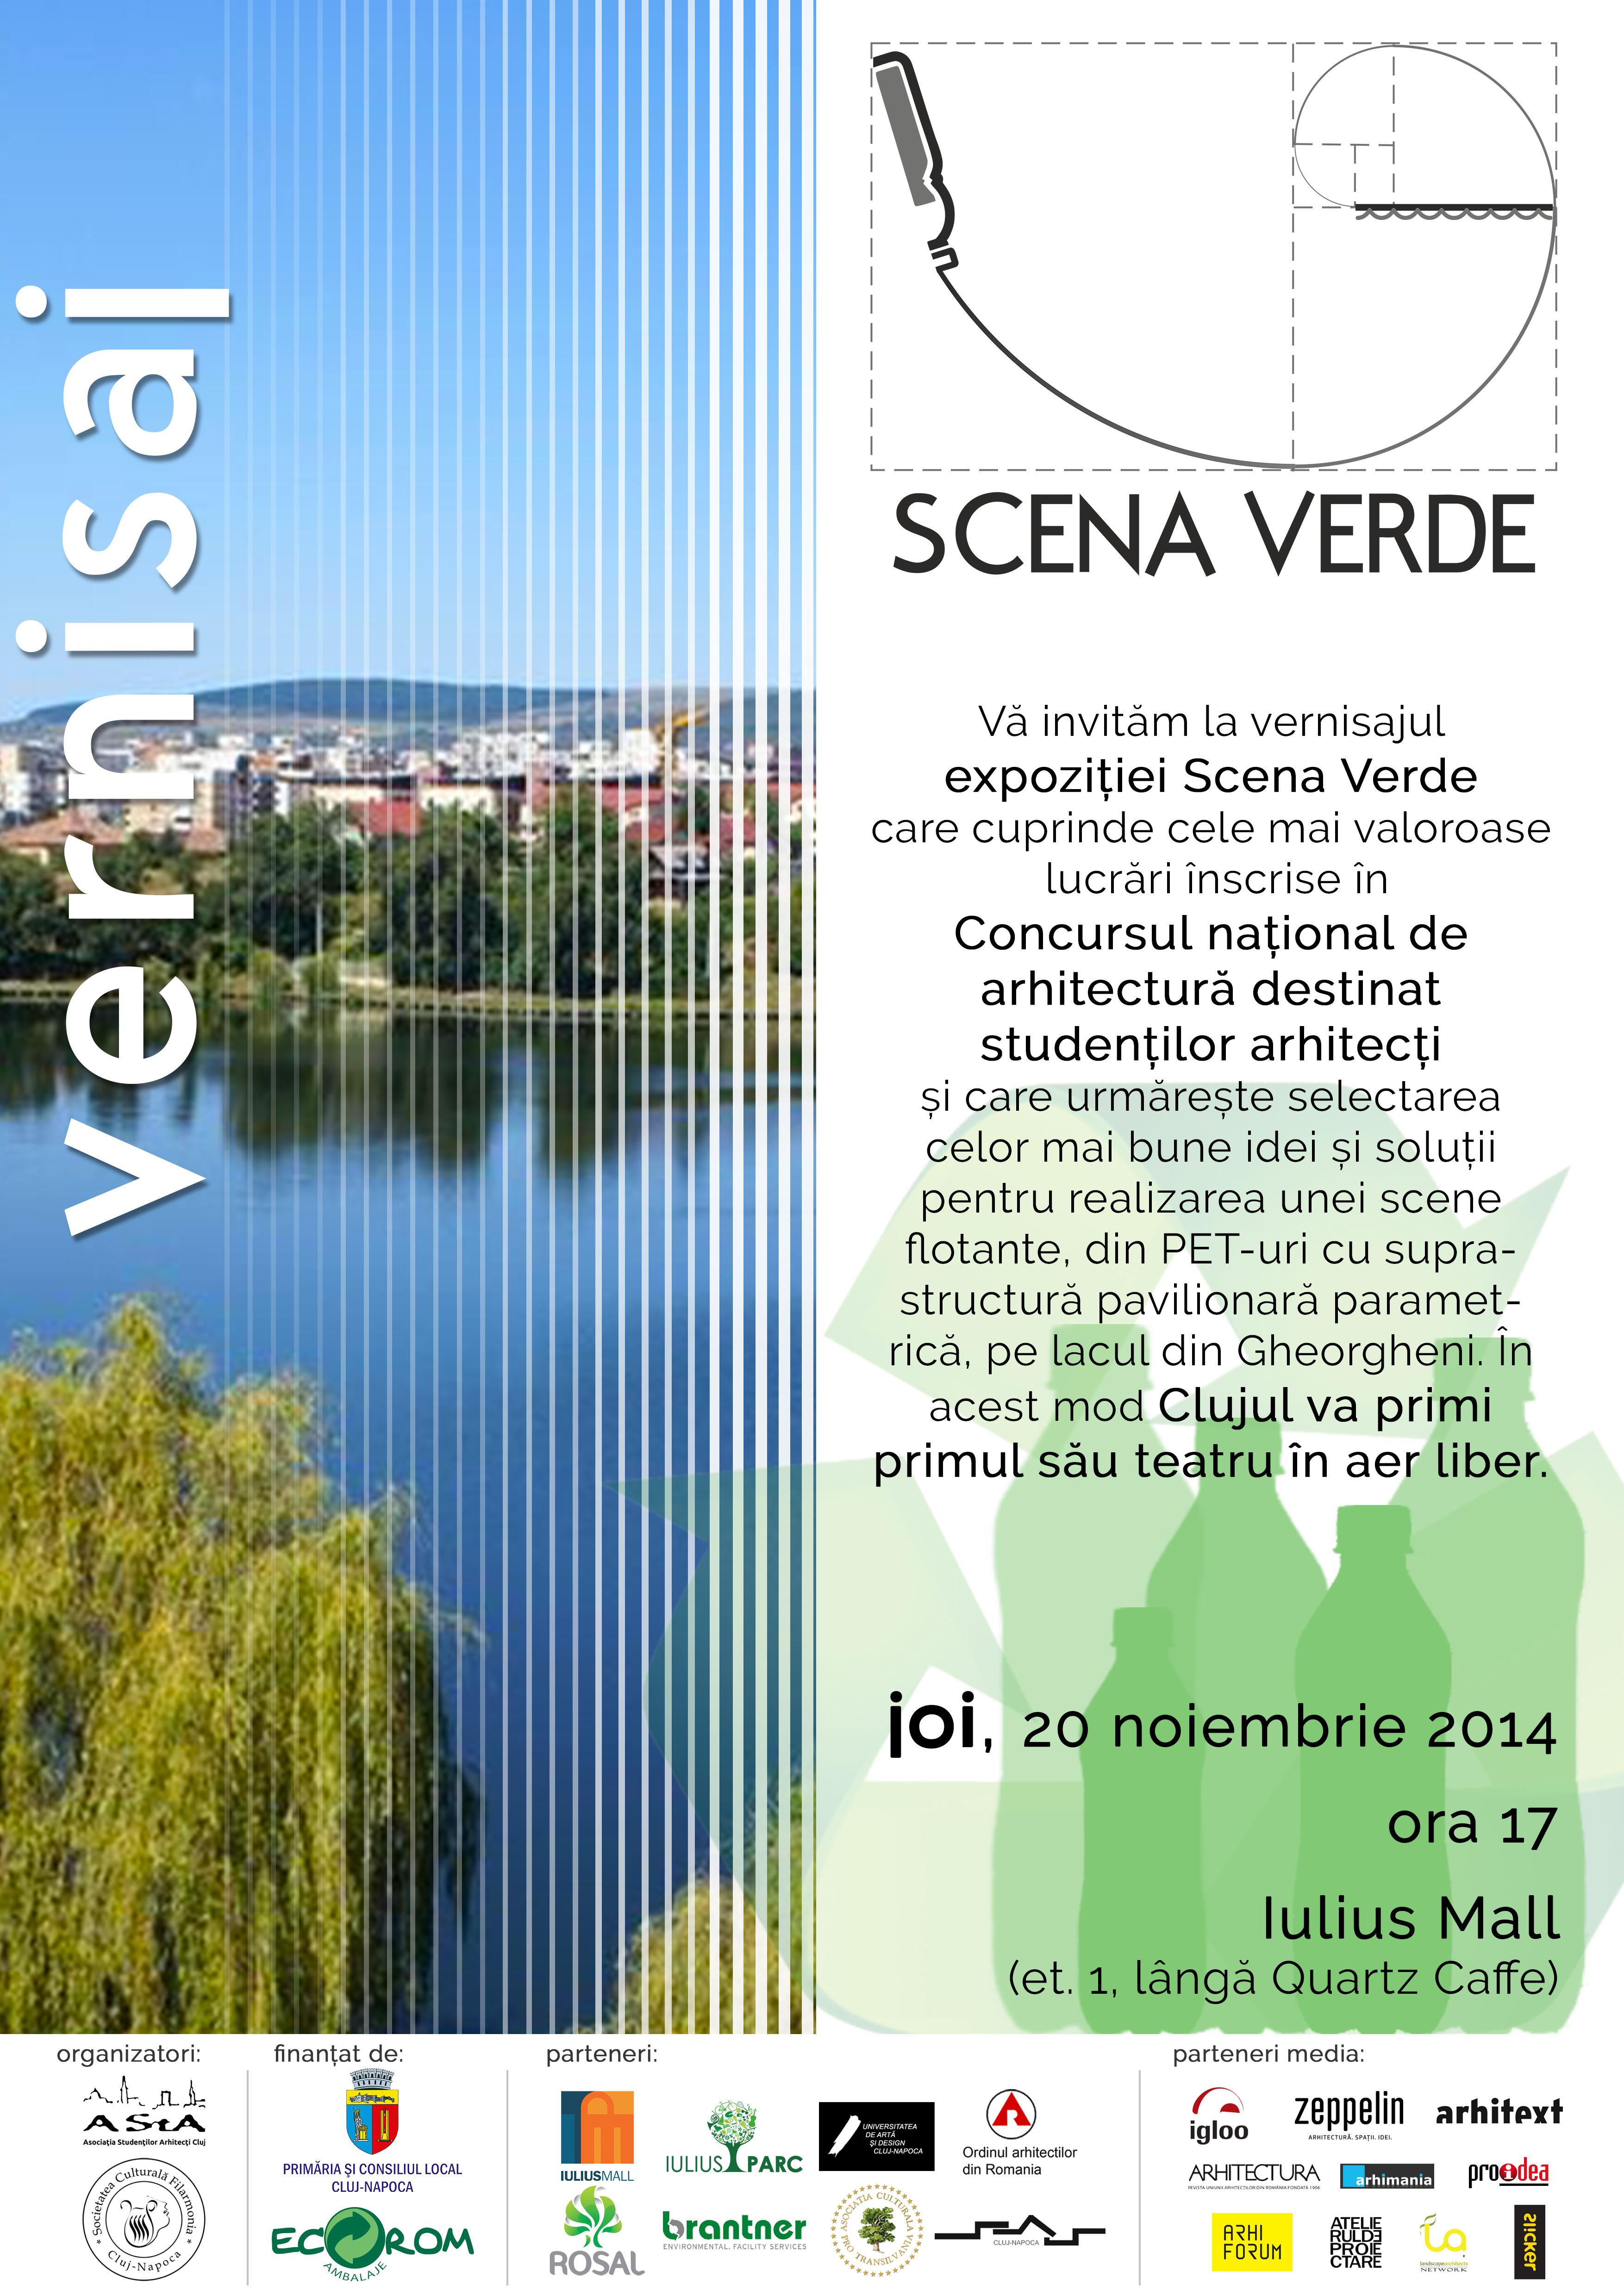 SCENA VERDE @ Cluj